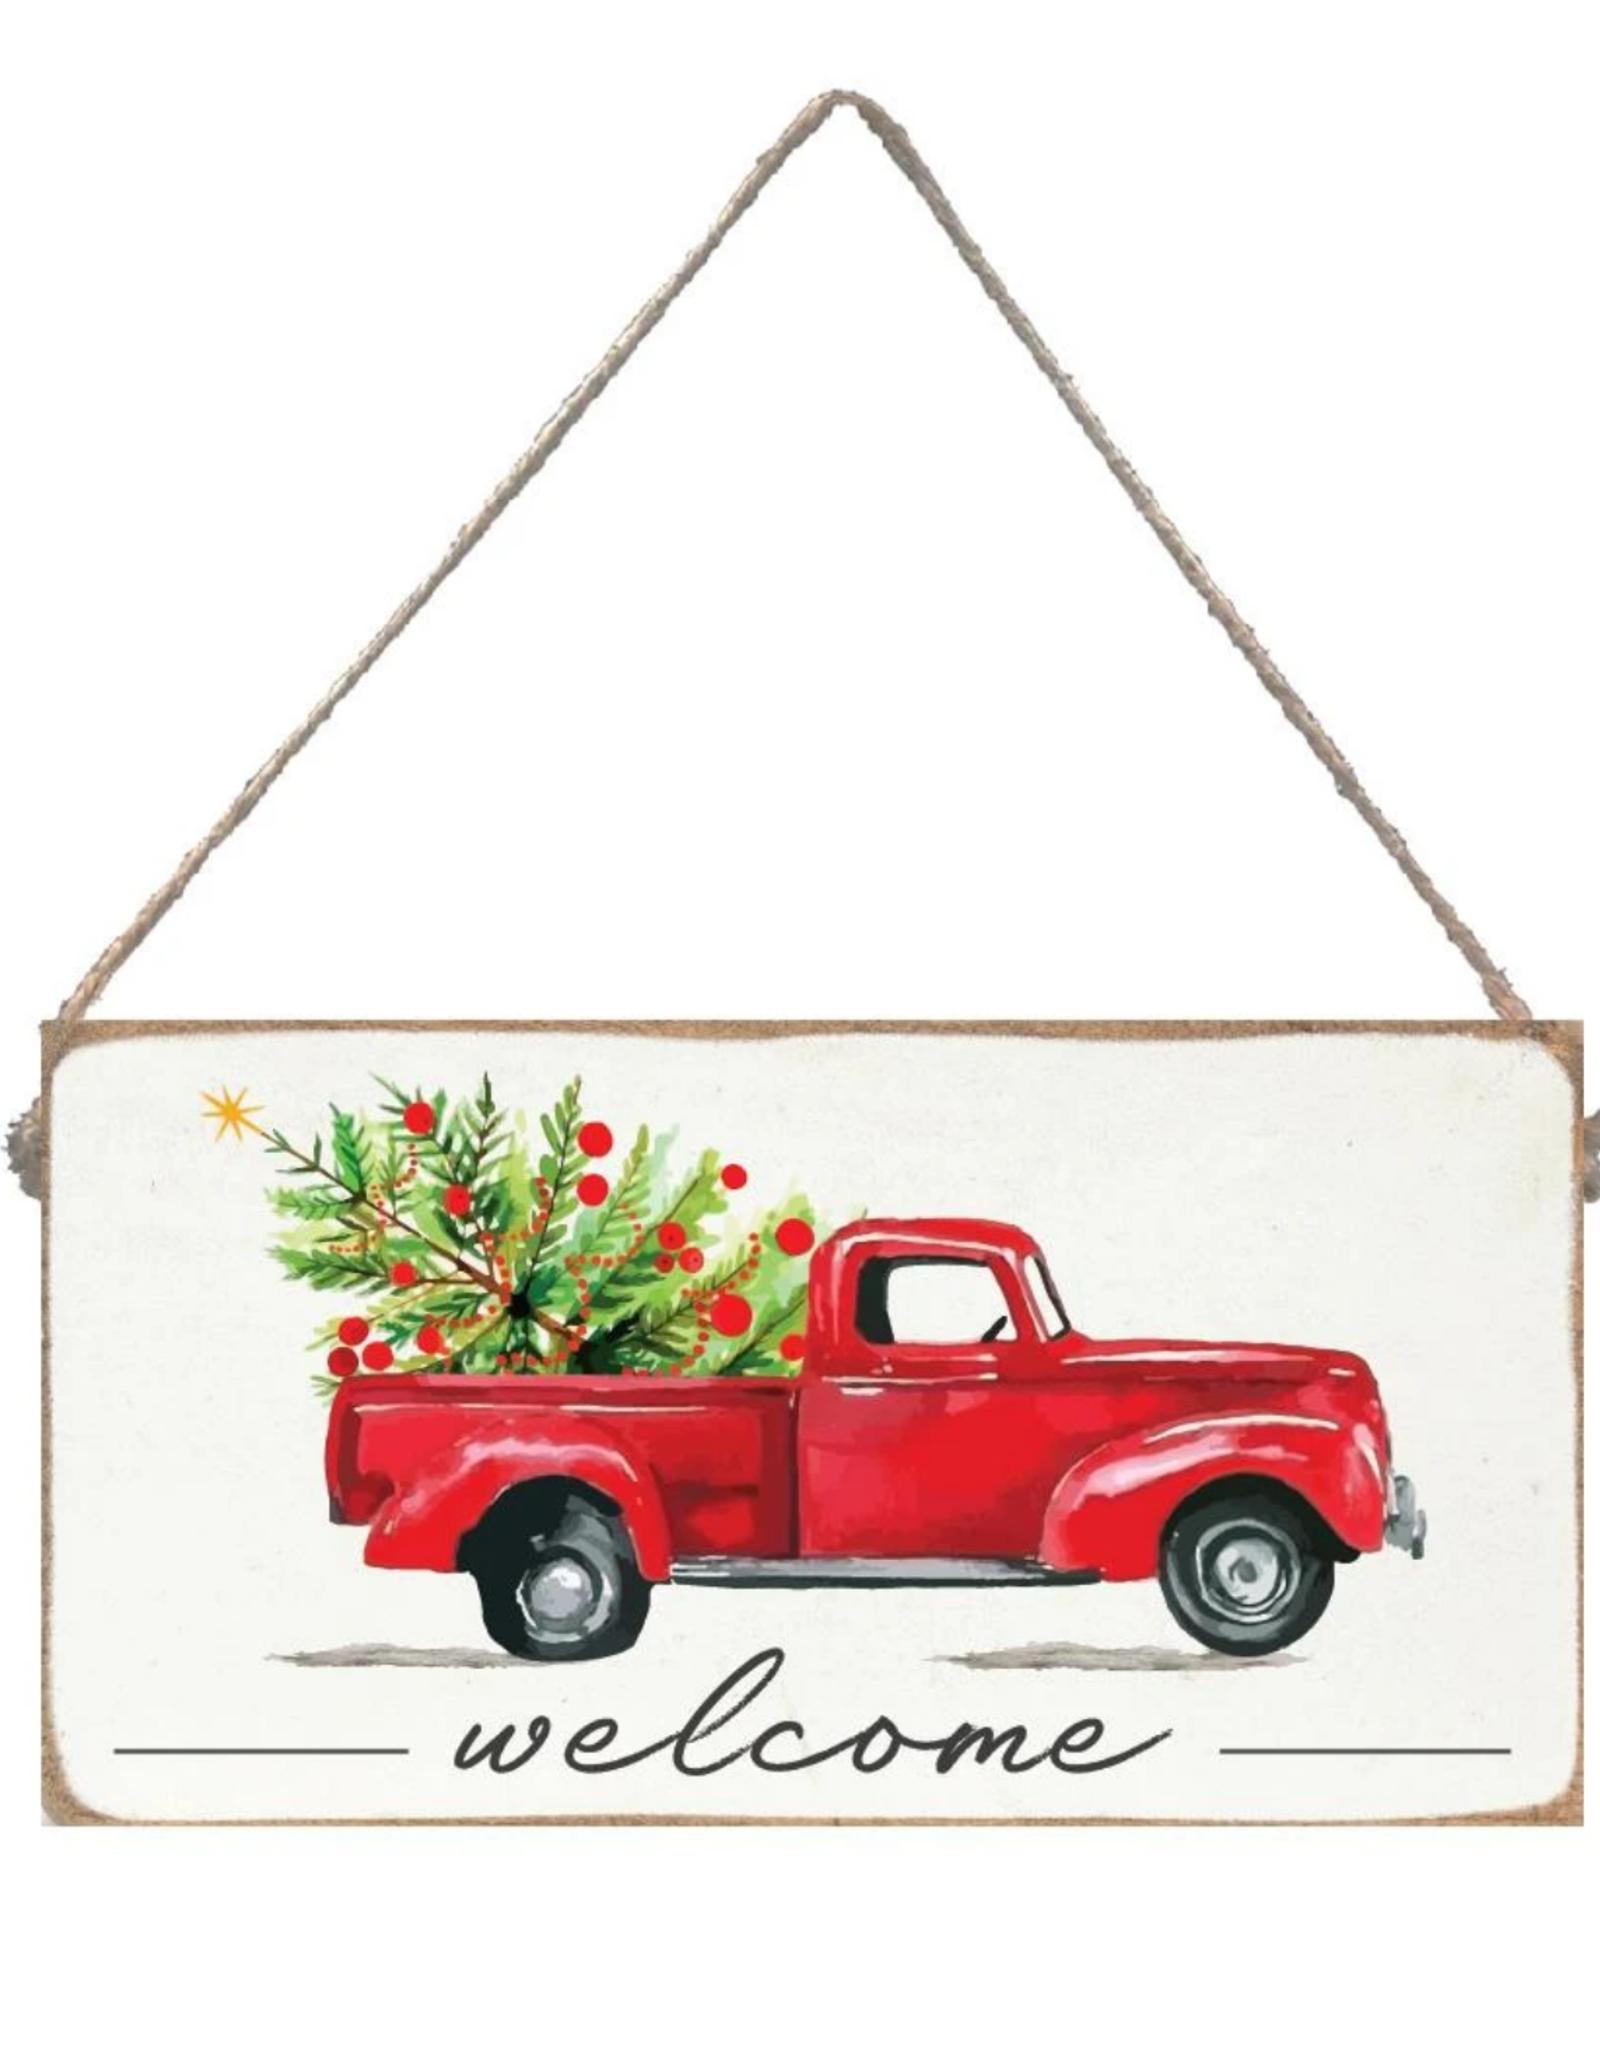 Rustic Marlin Rustic Marlin - Welcome Christmas Truck Mini Plank